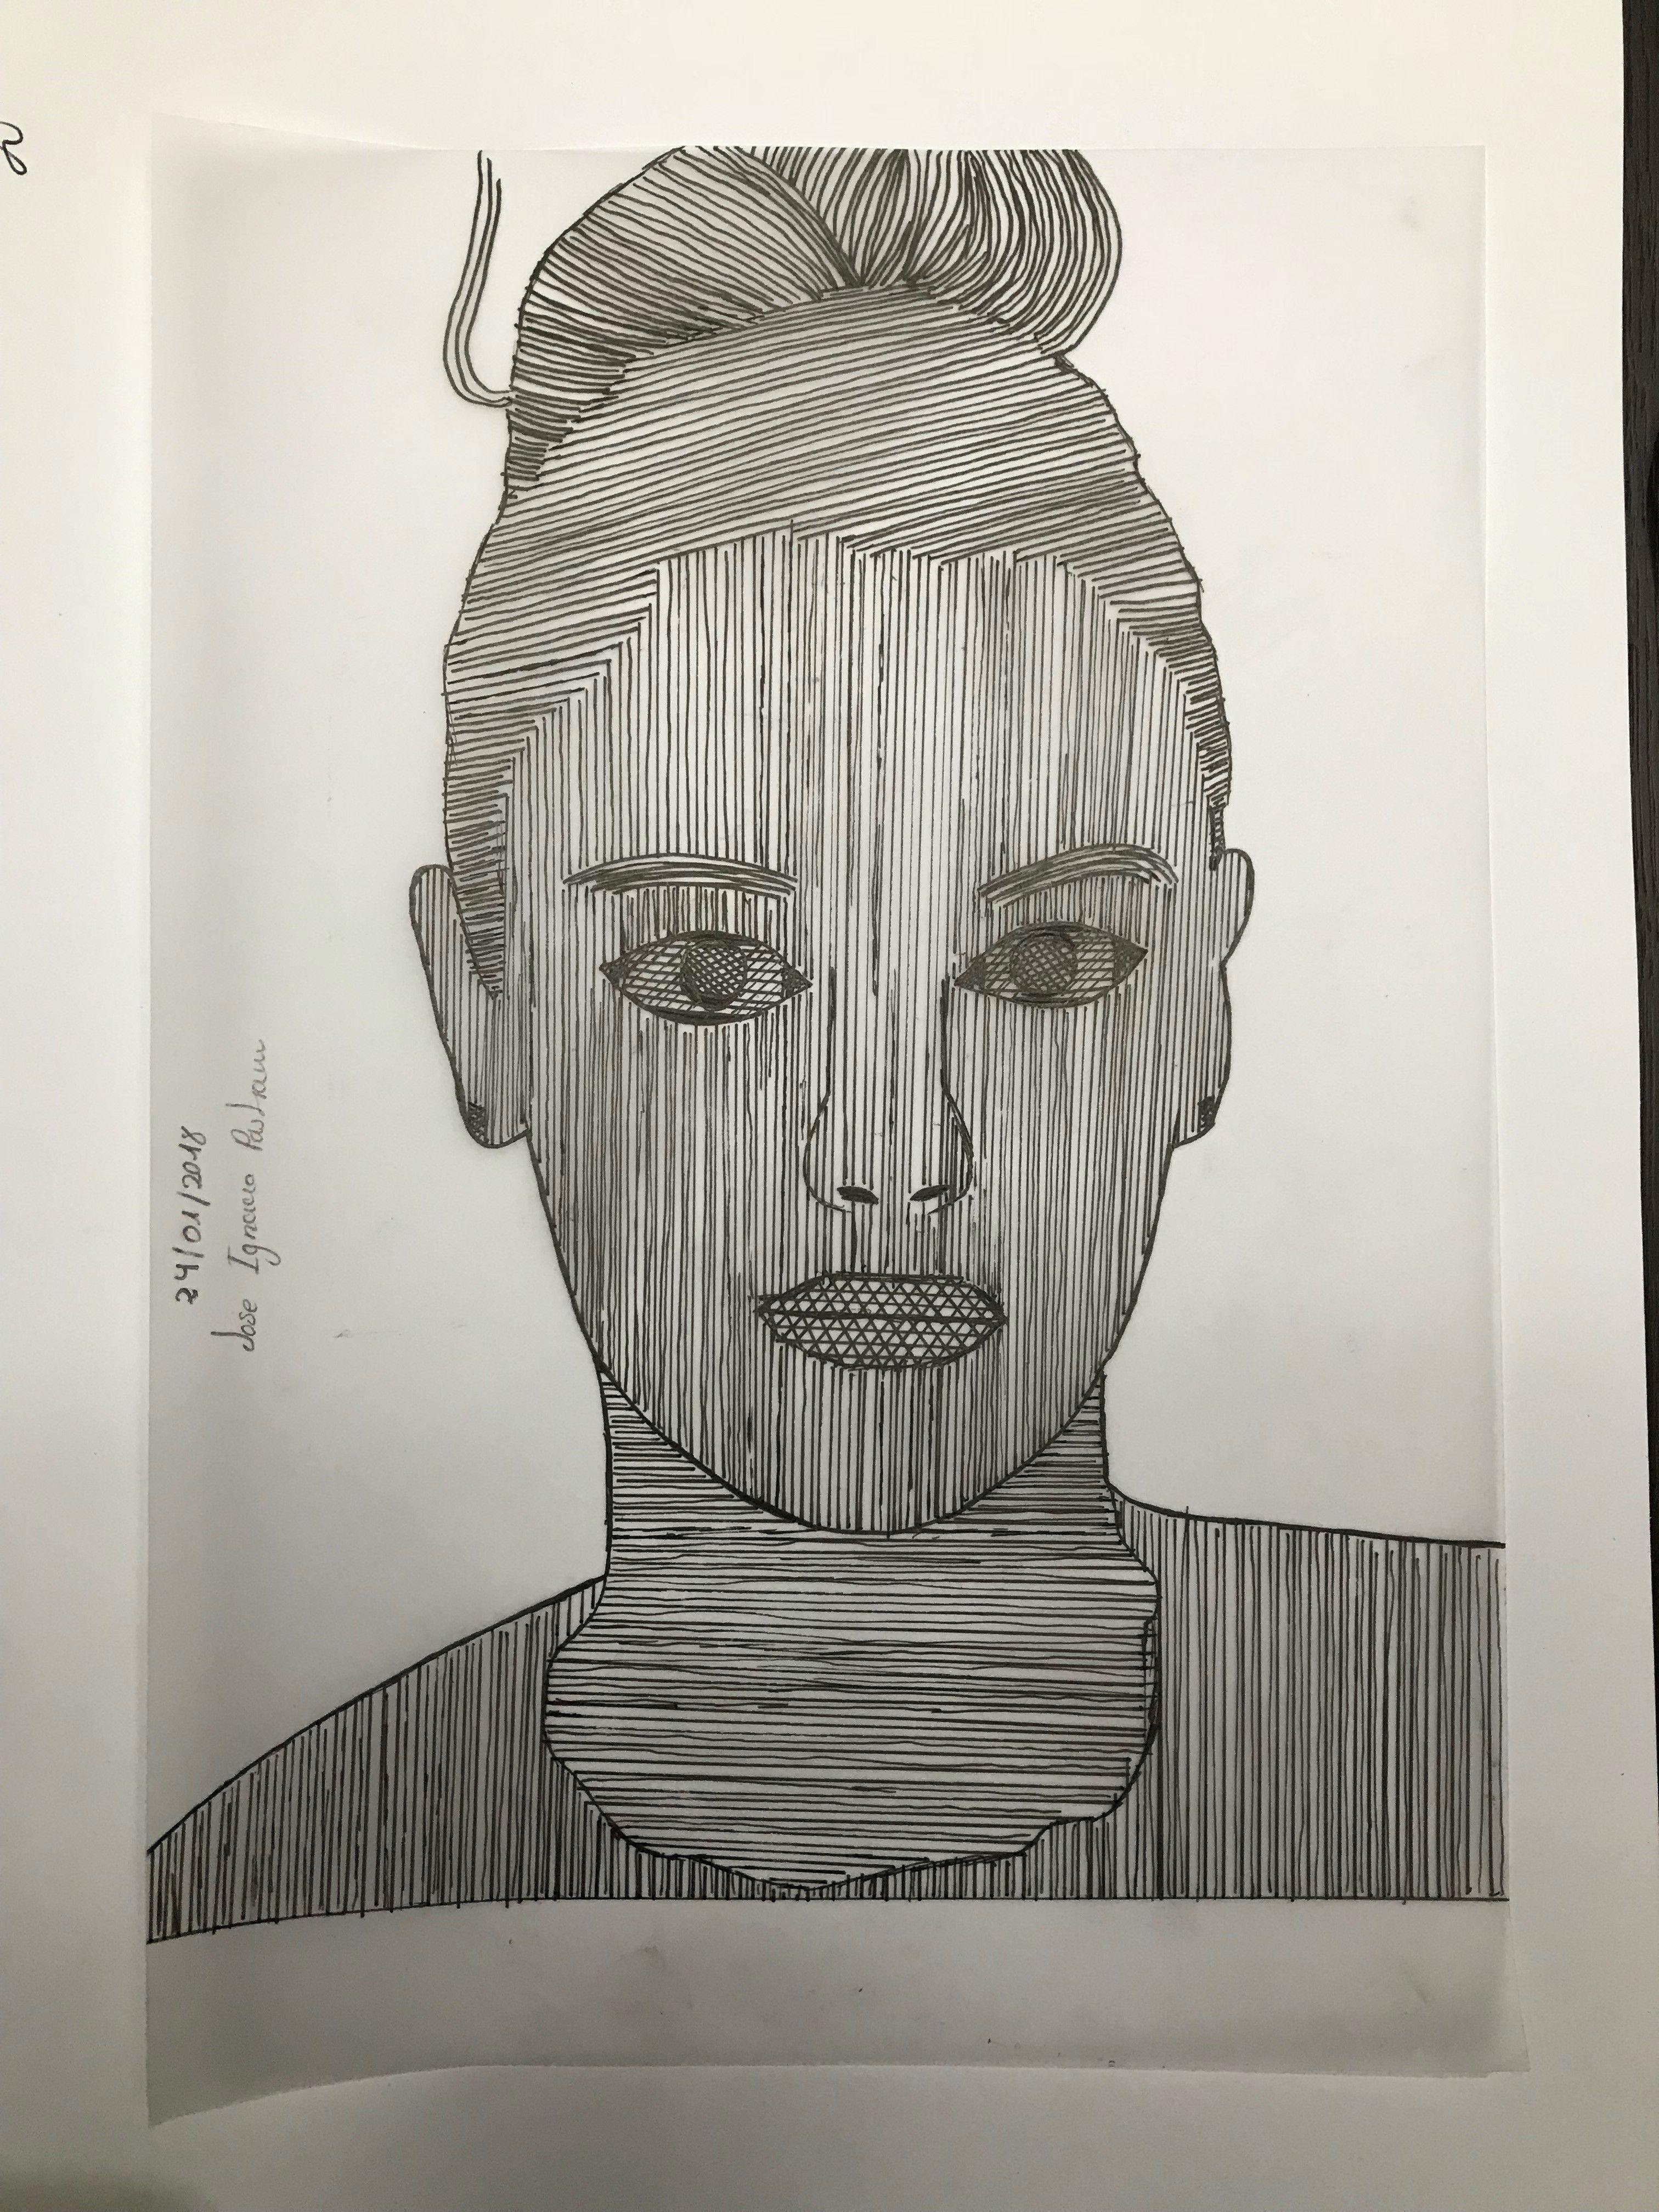 Ejercicio 2. Trama lineal mediante instrumental de dibujo. Dibujo 2 ...